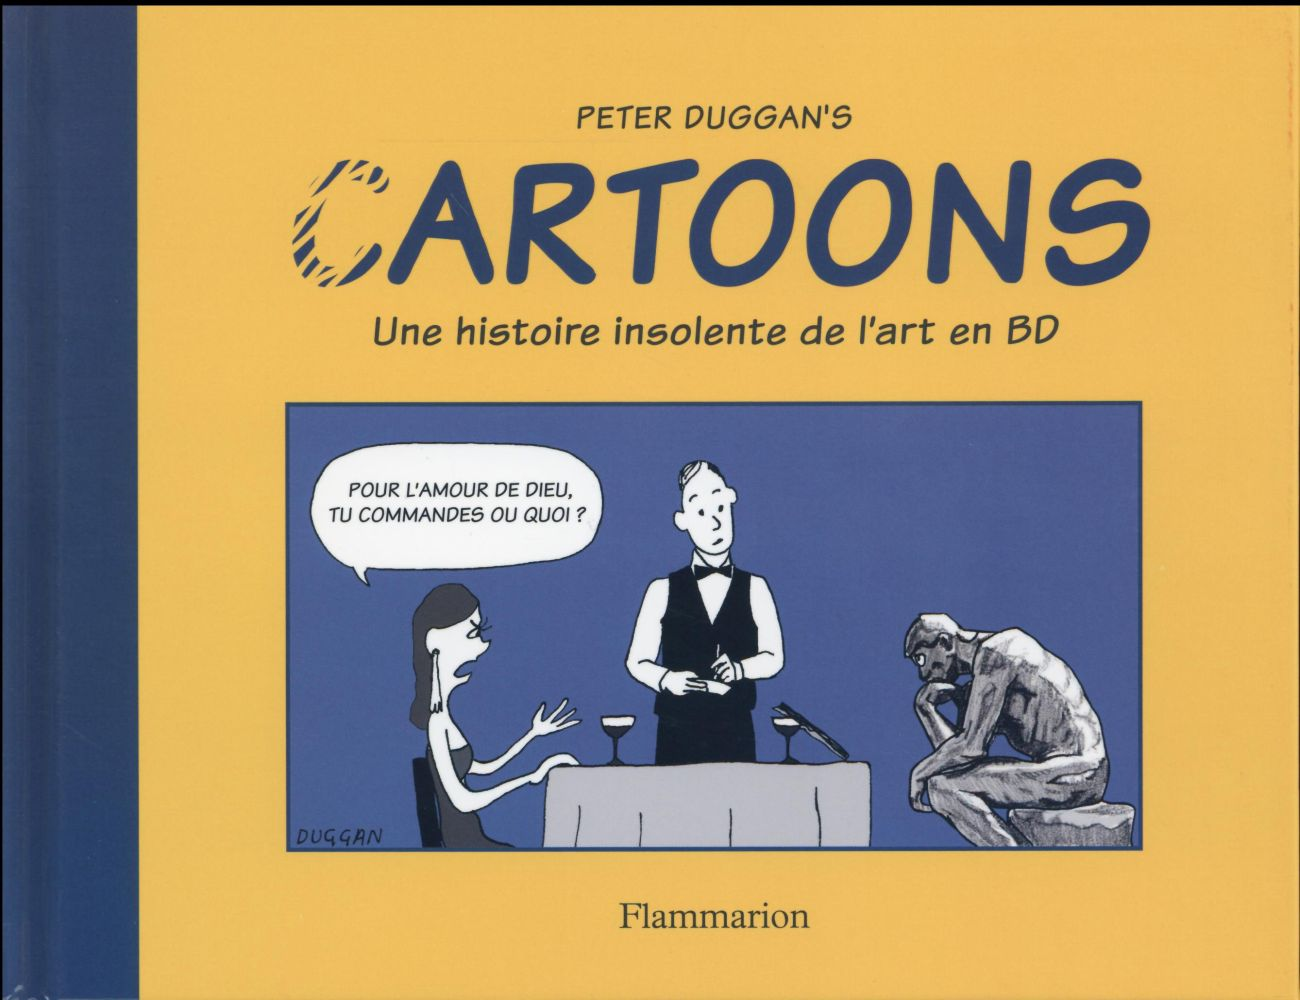 Cartoons, une histoire insolente de l'art en BD